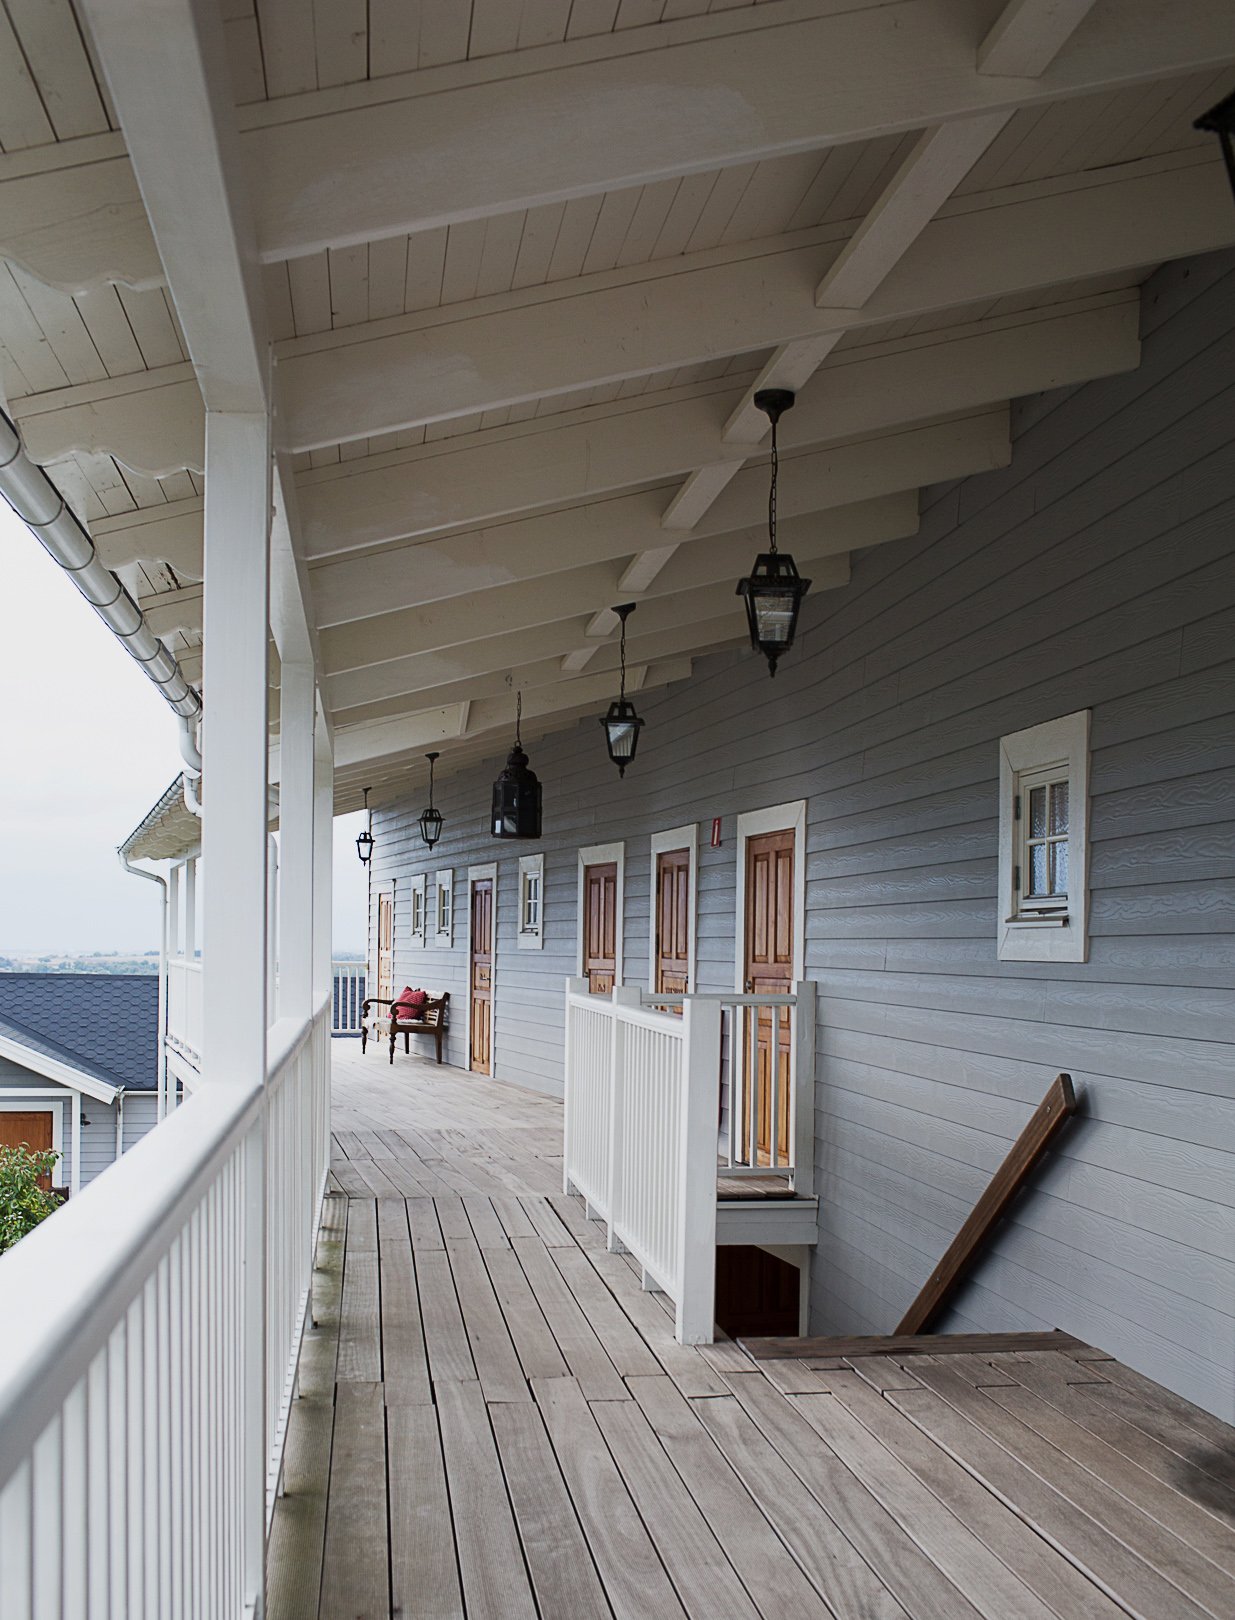 Blog meeting - The lodge hotel